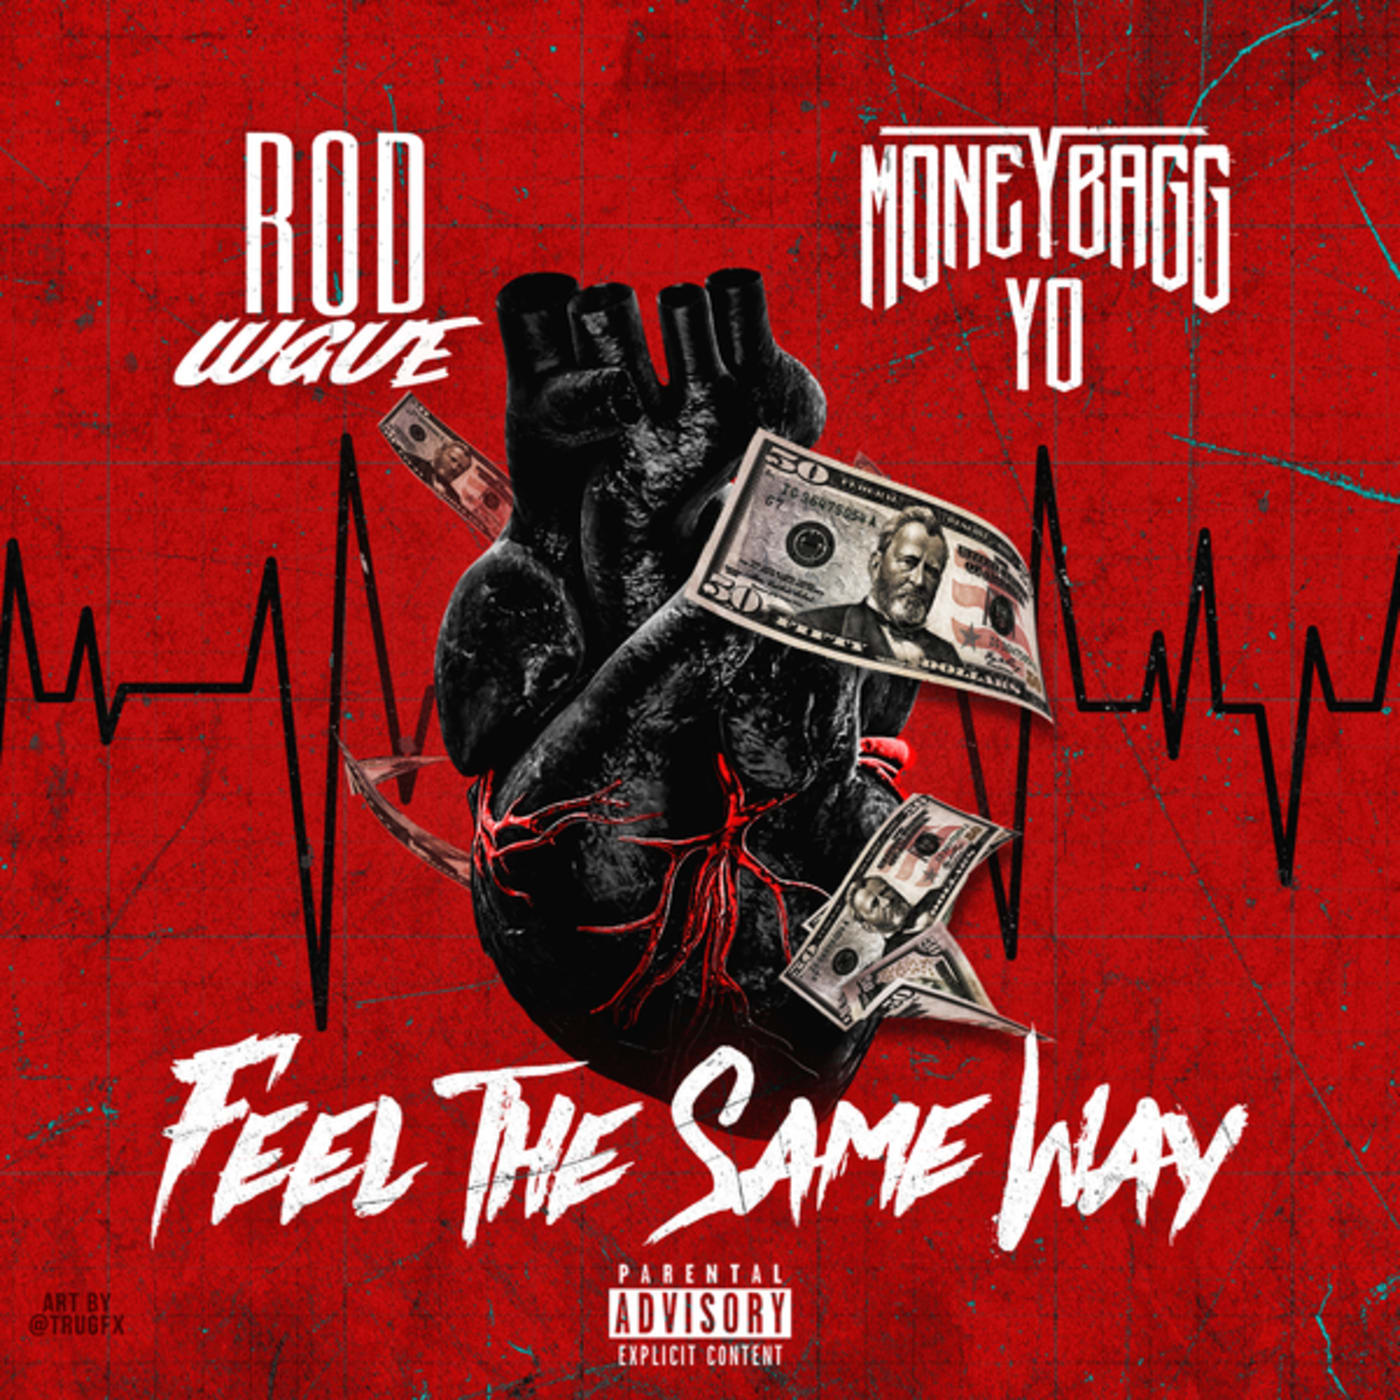 rod wave moneybagg yo cover art